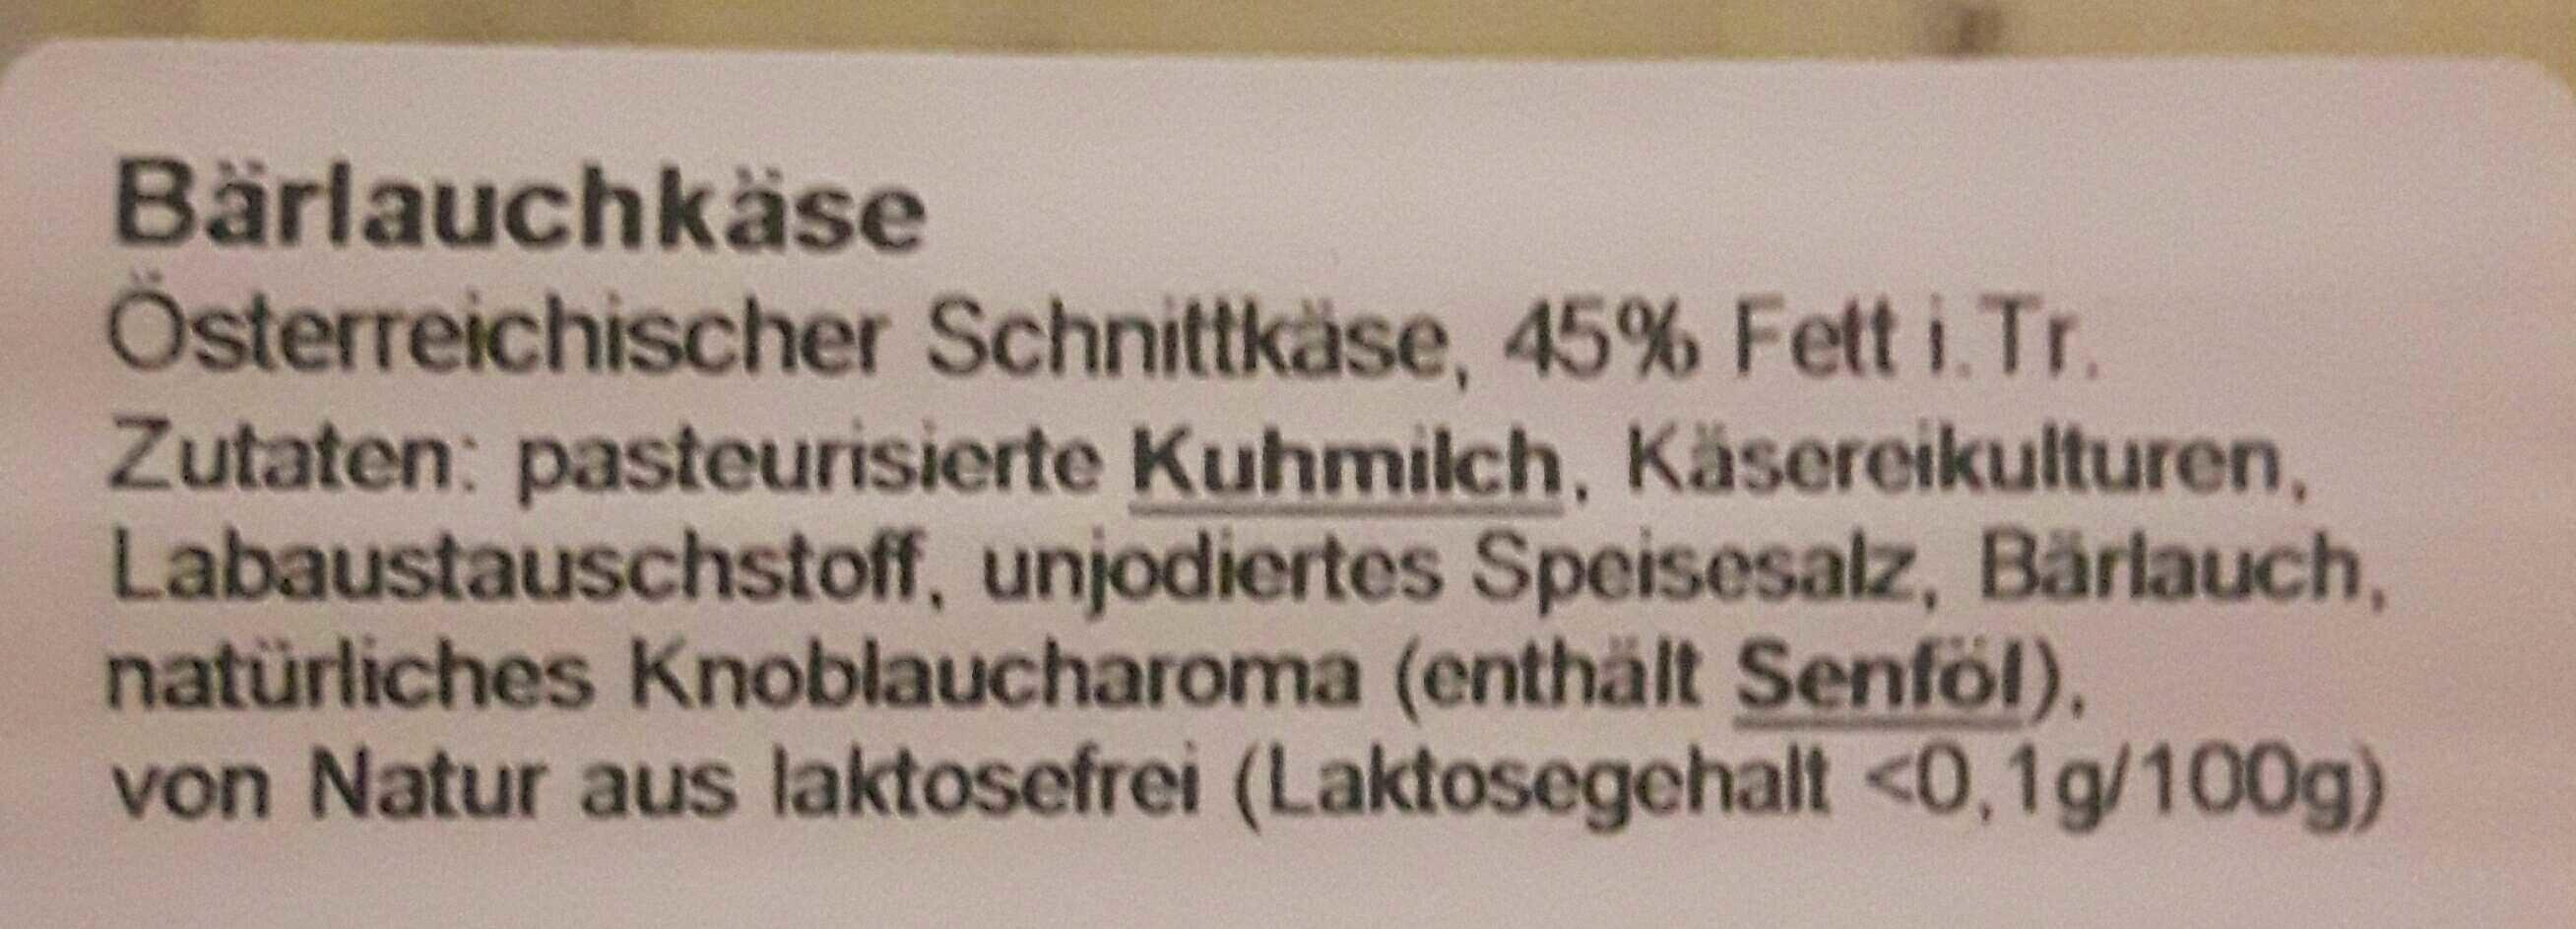 Bärlauchkäse - Ingredients